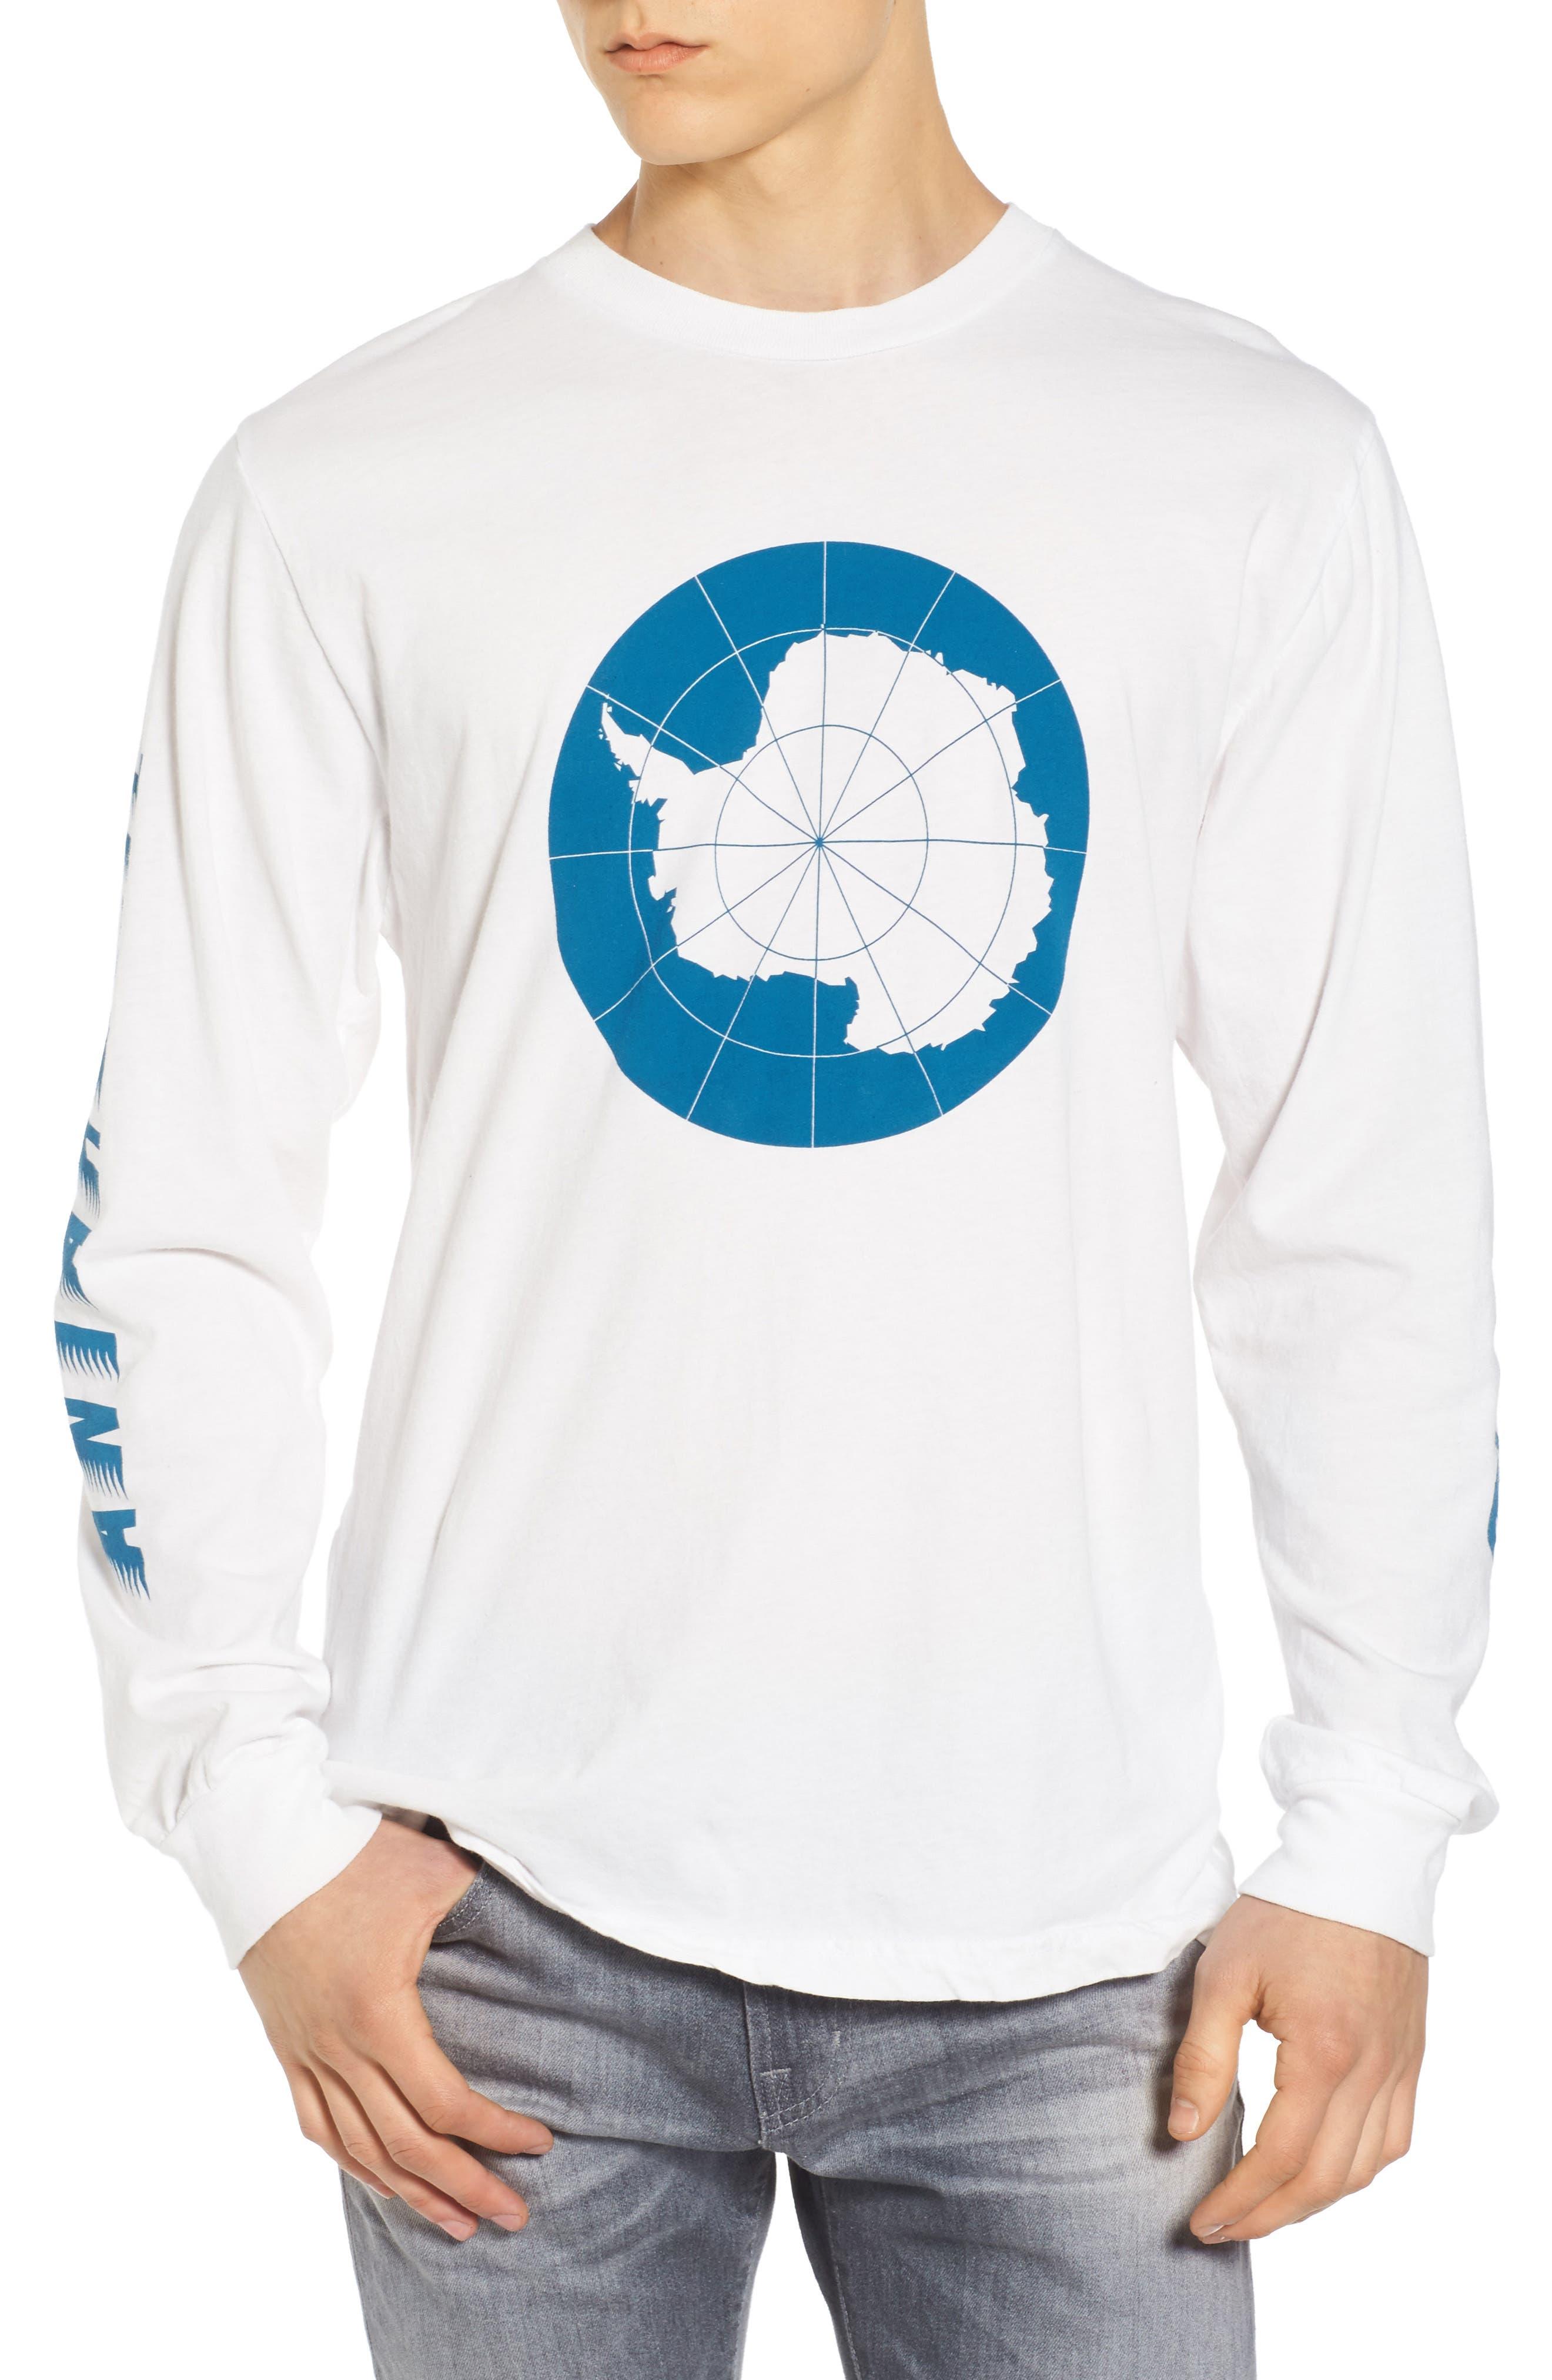 Arctic Ski Club T-Shirt,                             Main thumbnail 1, color,                             100